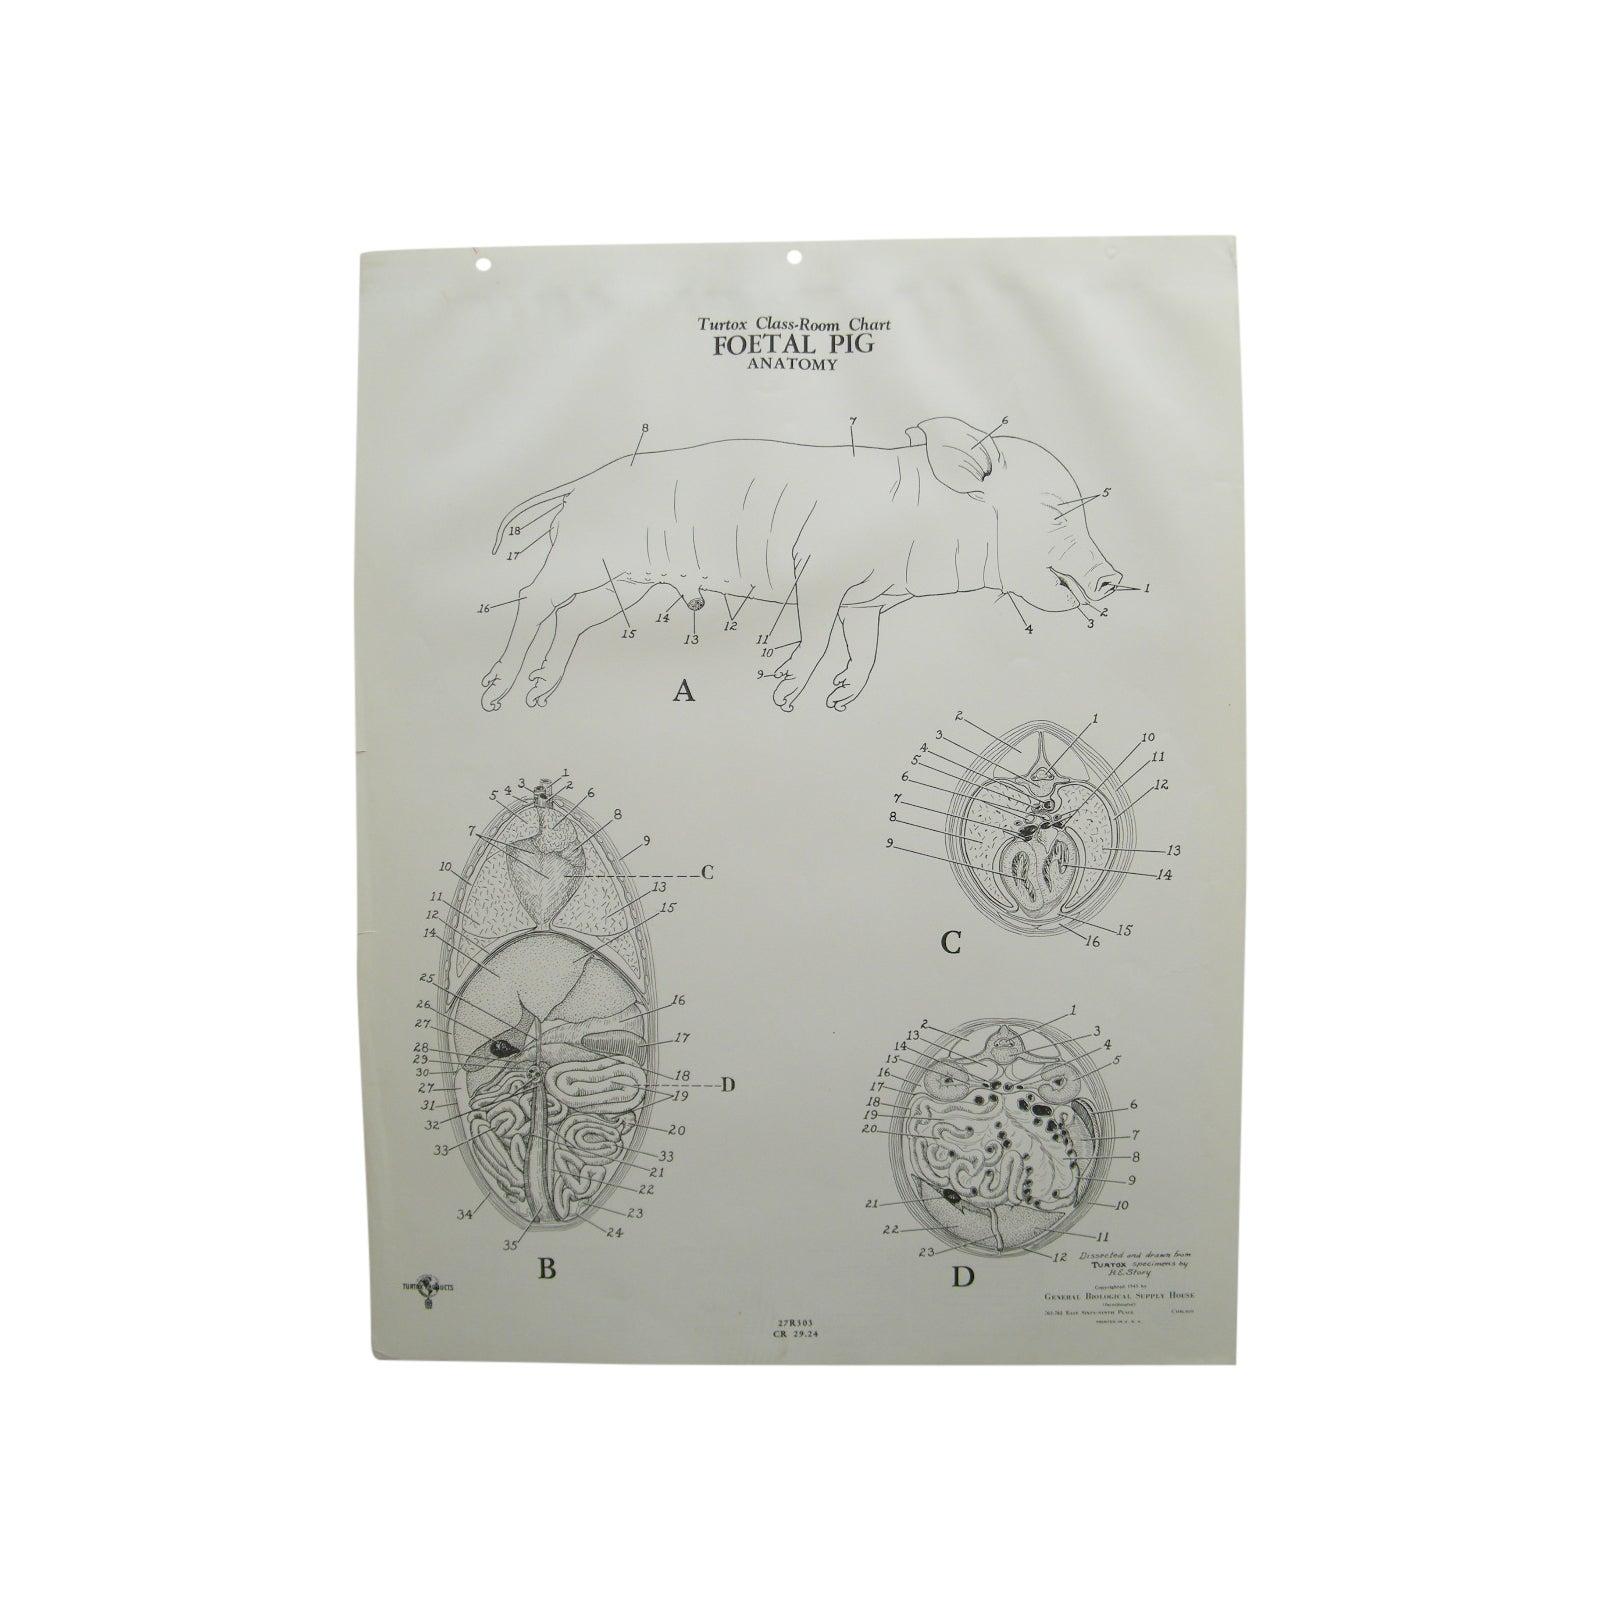 Luxury Fetal Pig Anatomy Illustration - Anatomy and Physiology ...